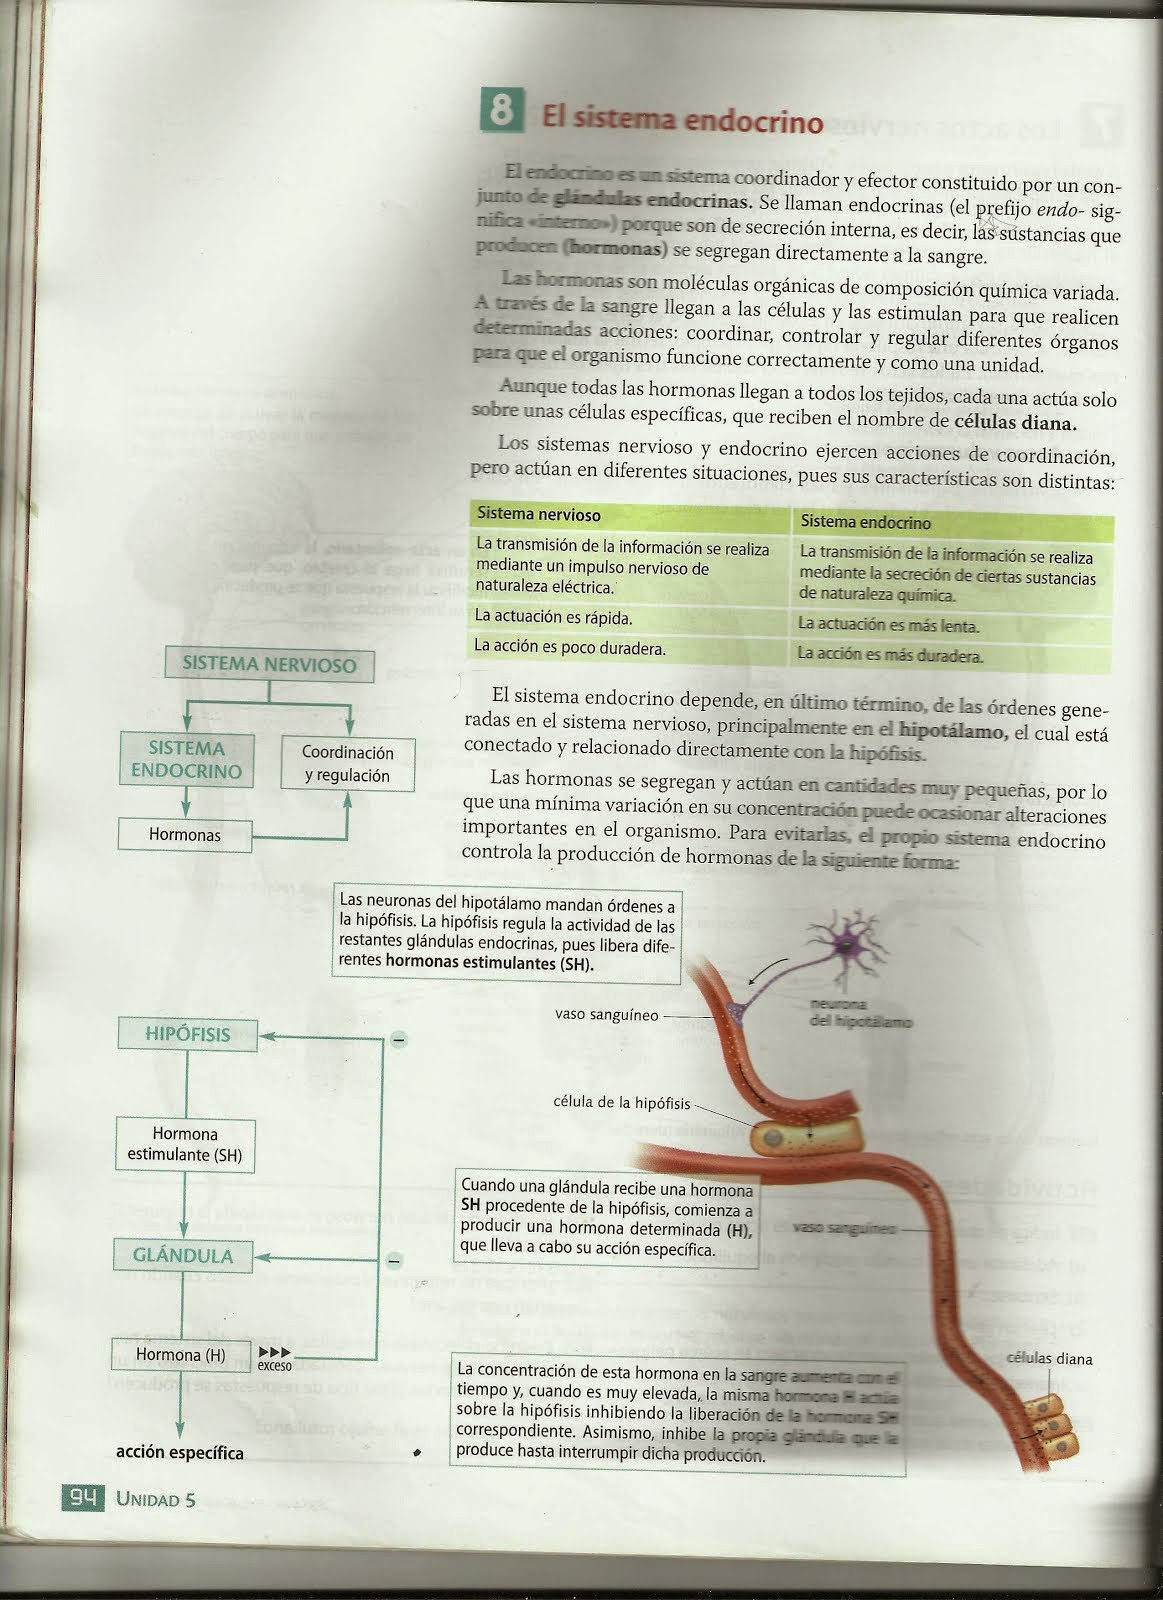 Sistema Endocrino: Curiosidades del sistema endocrino